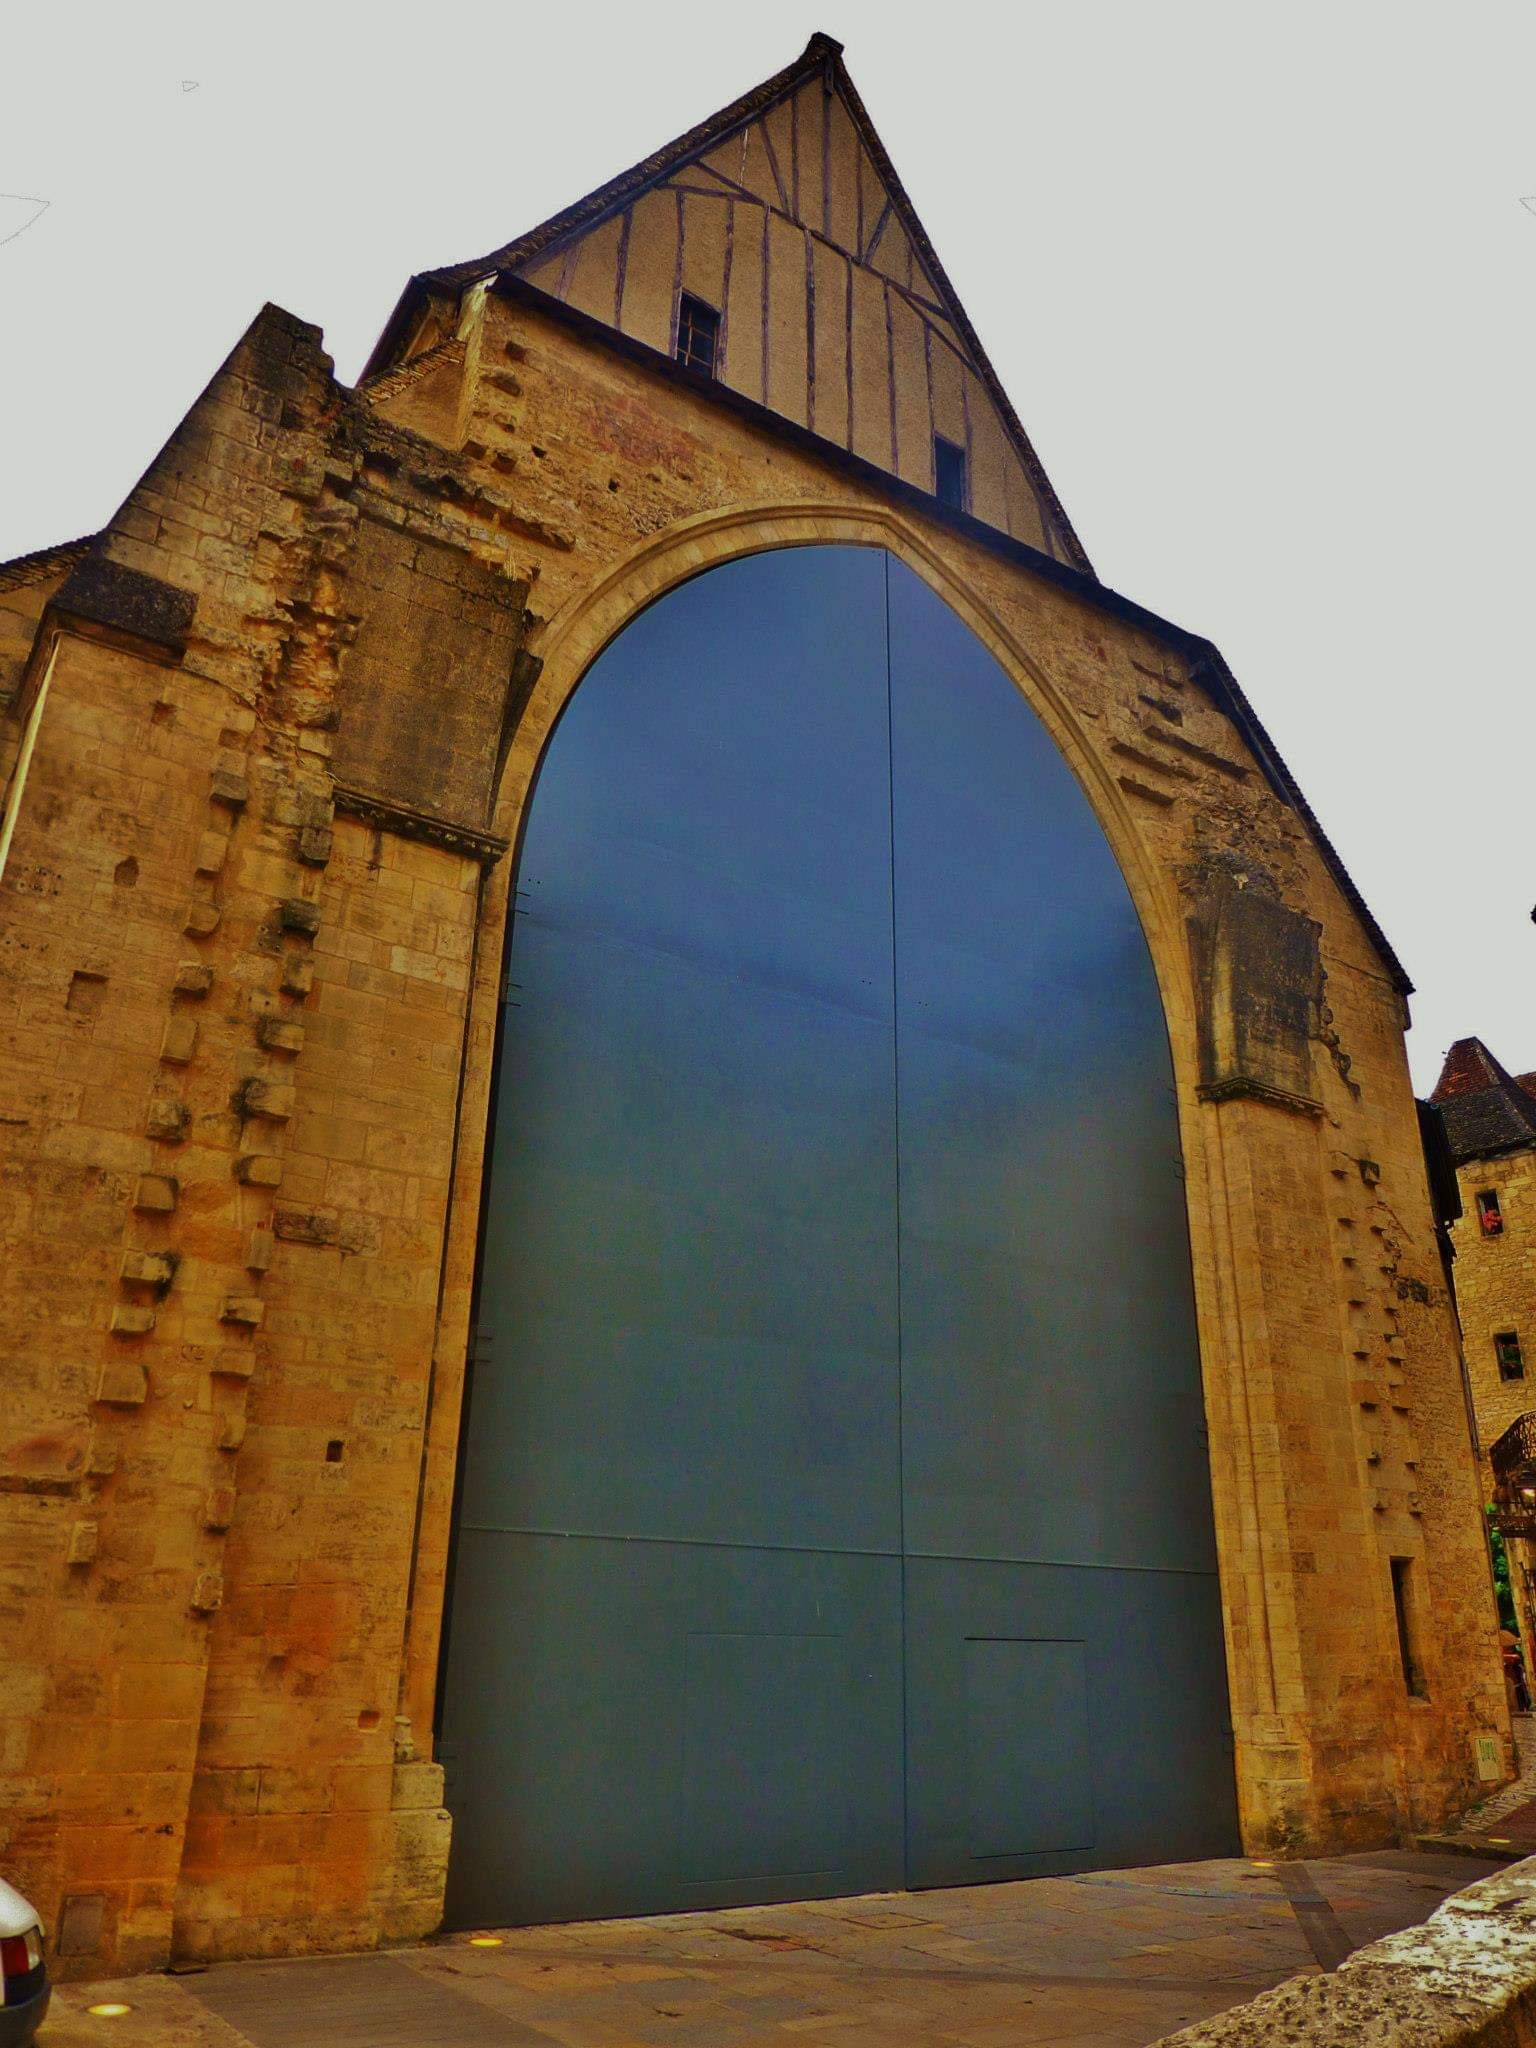 Séjourner en Dordogne proche de Sarlat